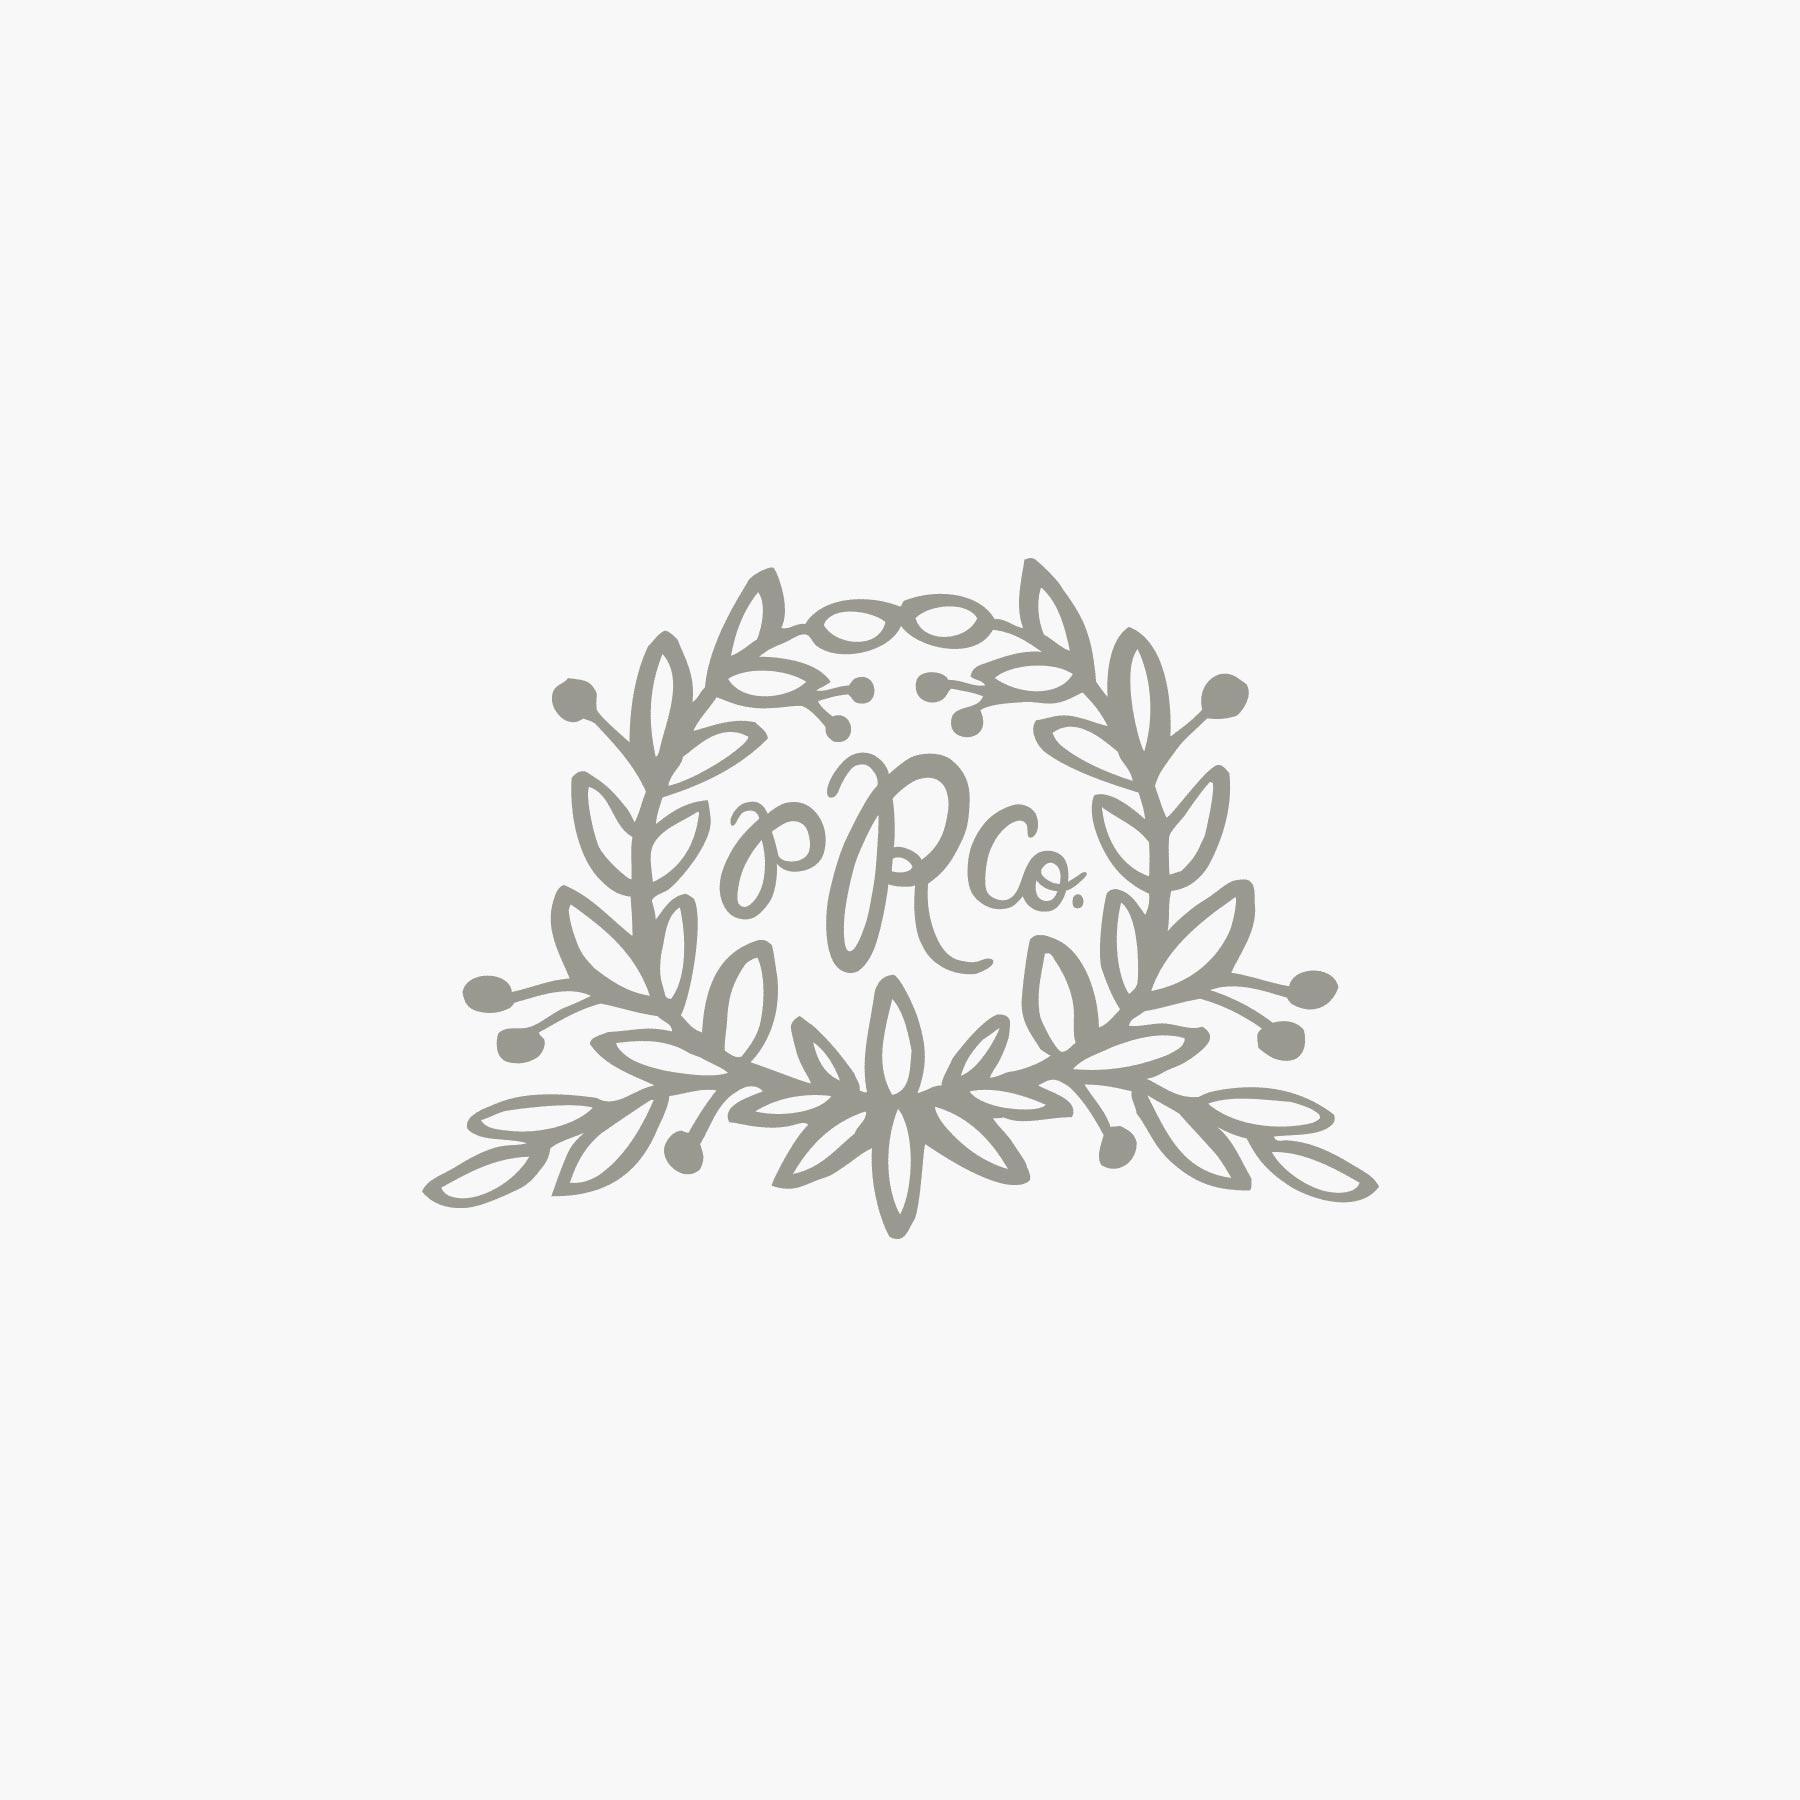 Motif Personalized Flat Notes- Assorted Botanical